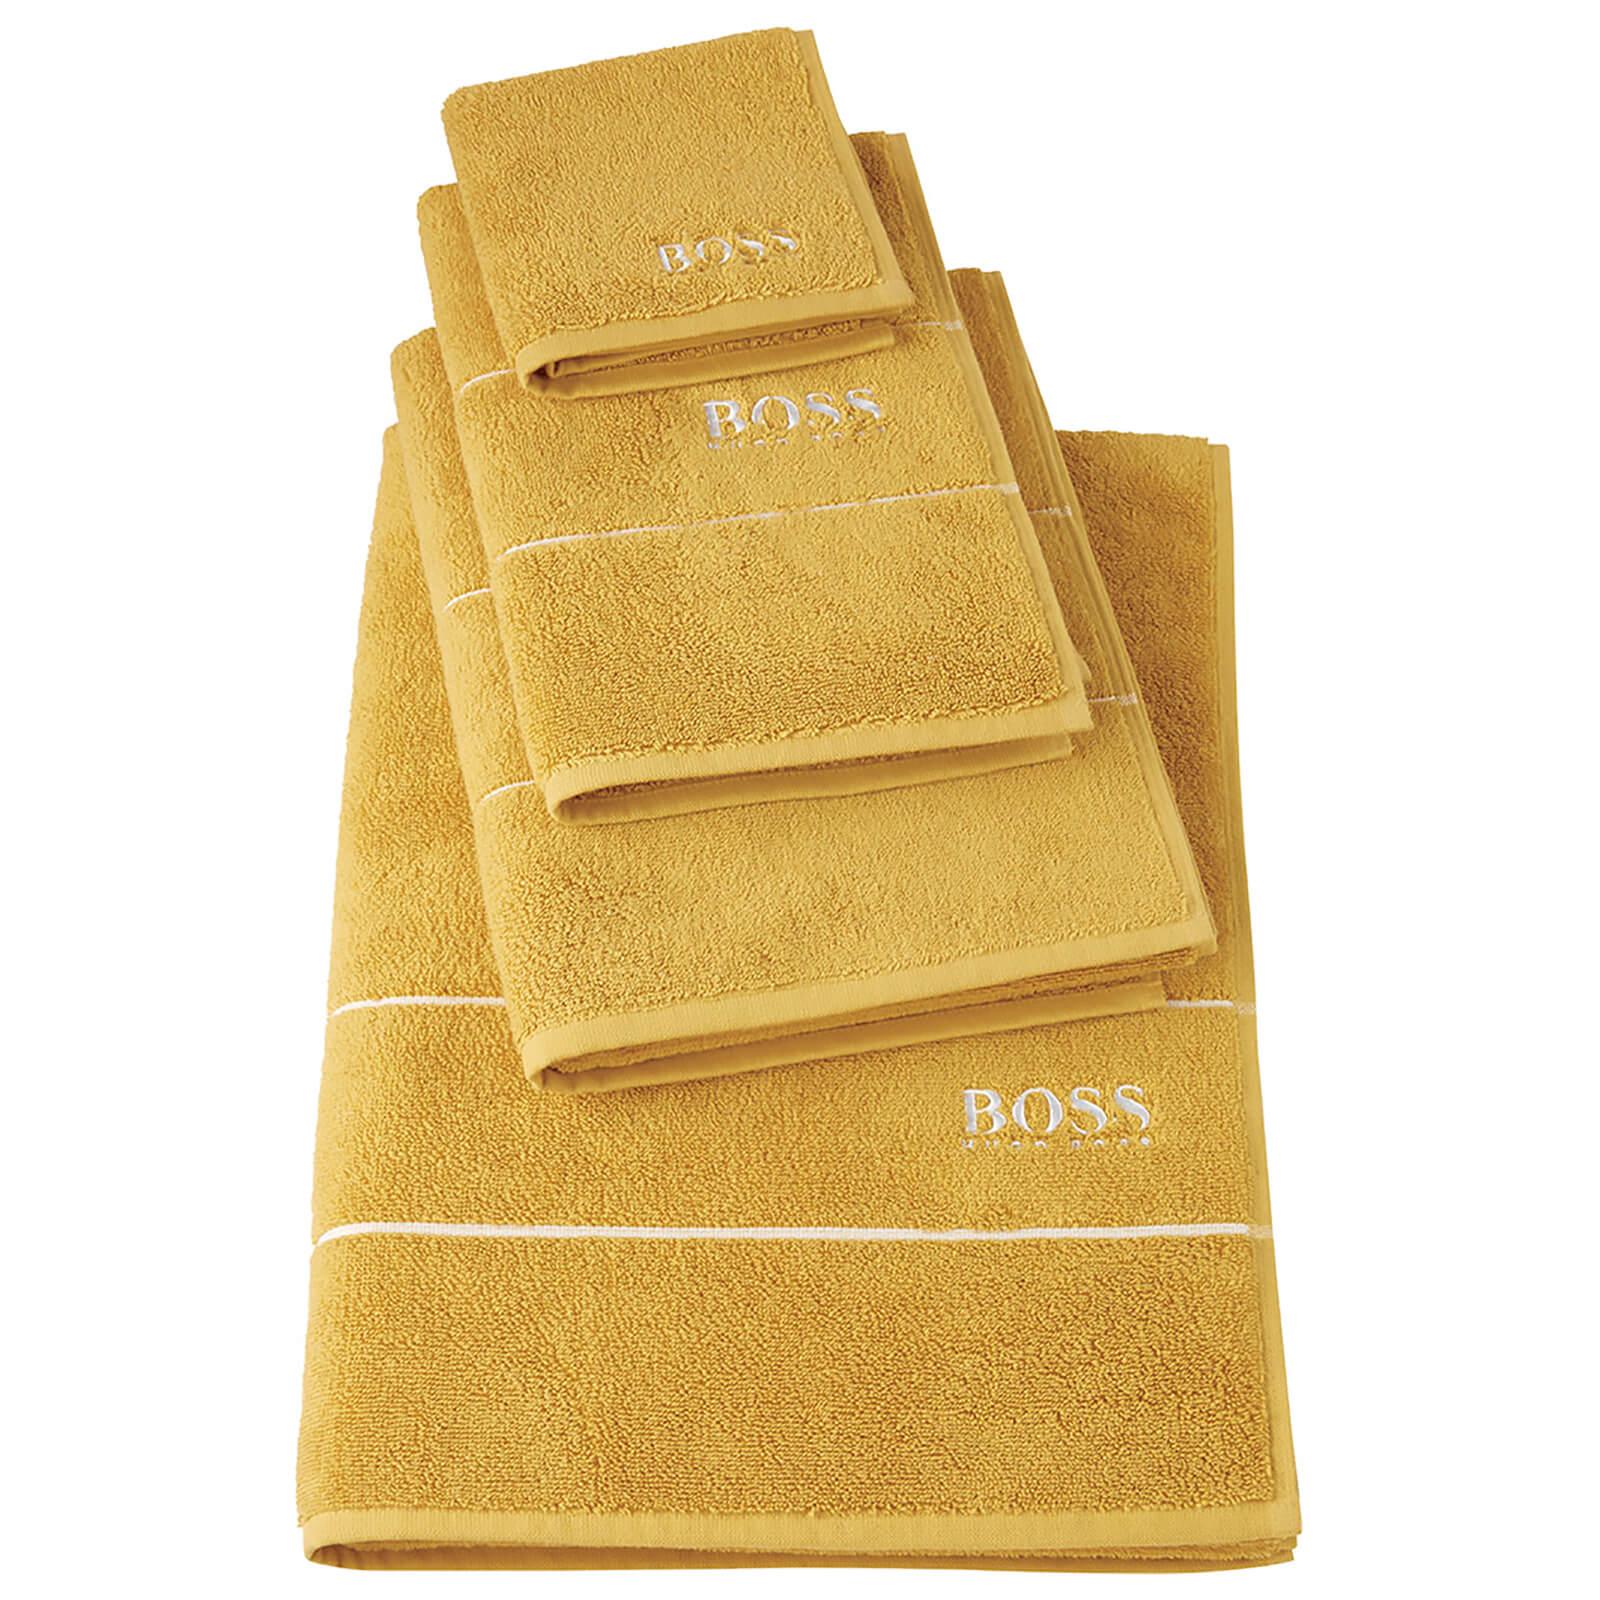 Hugo Boss Plain Towels - Topaz - Hand Towel - Yellow